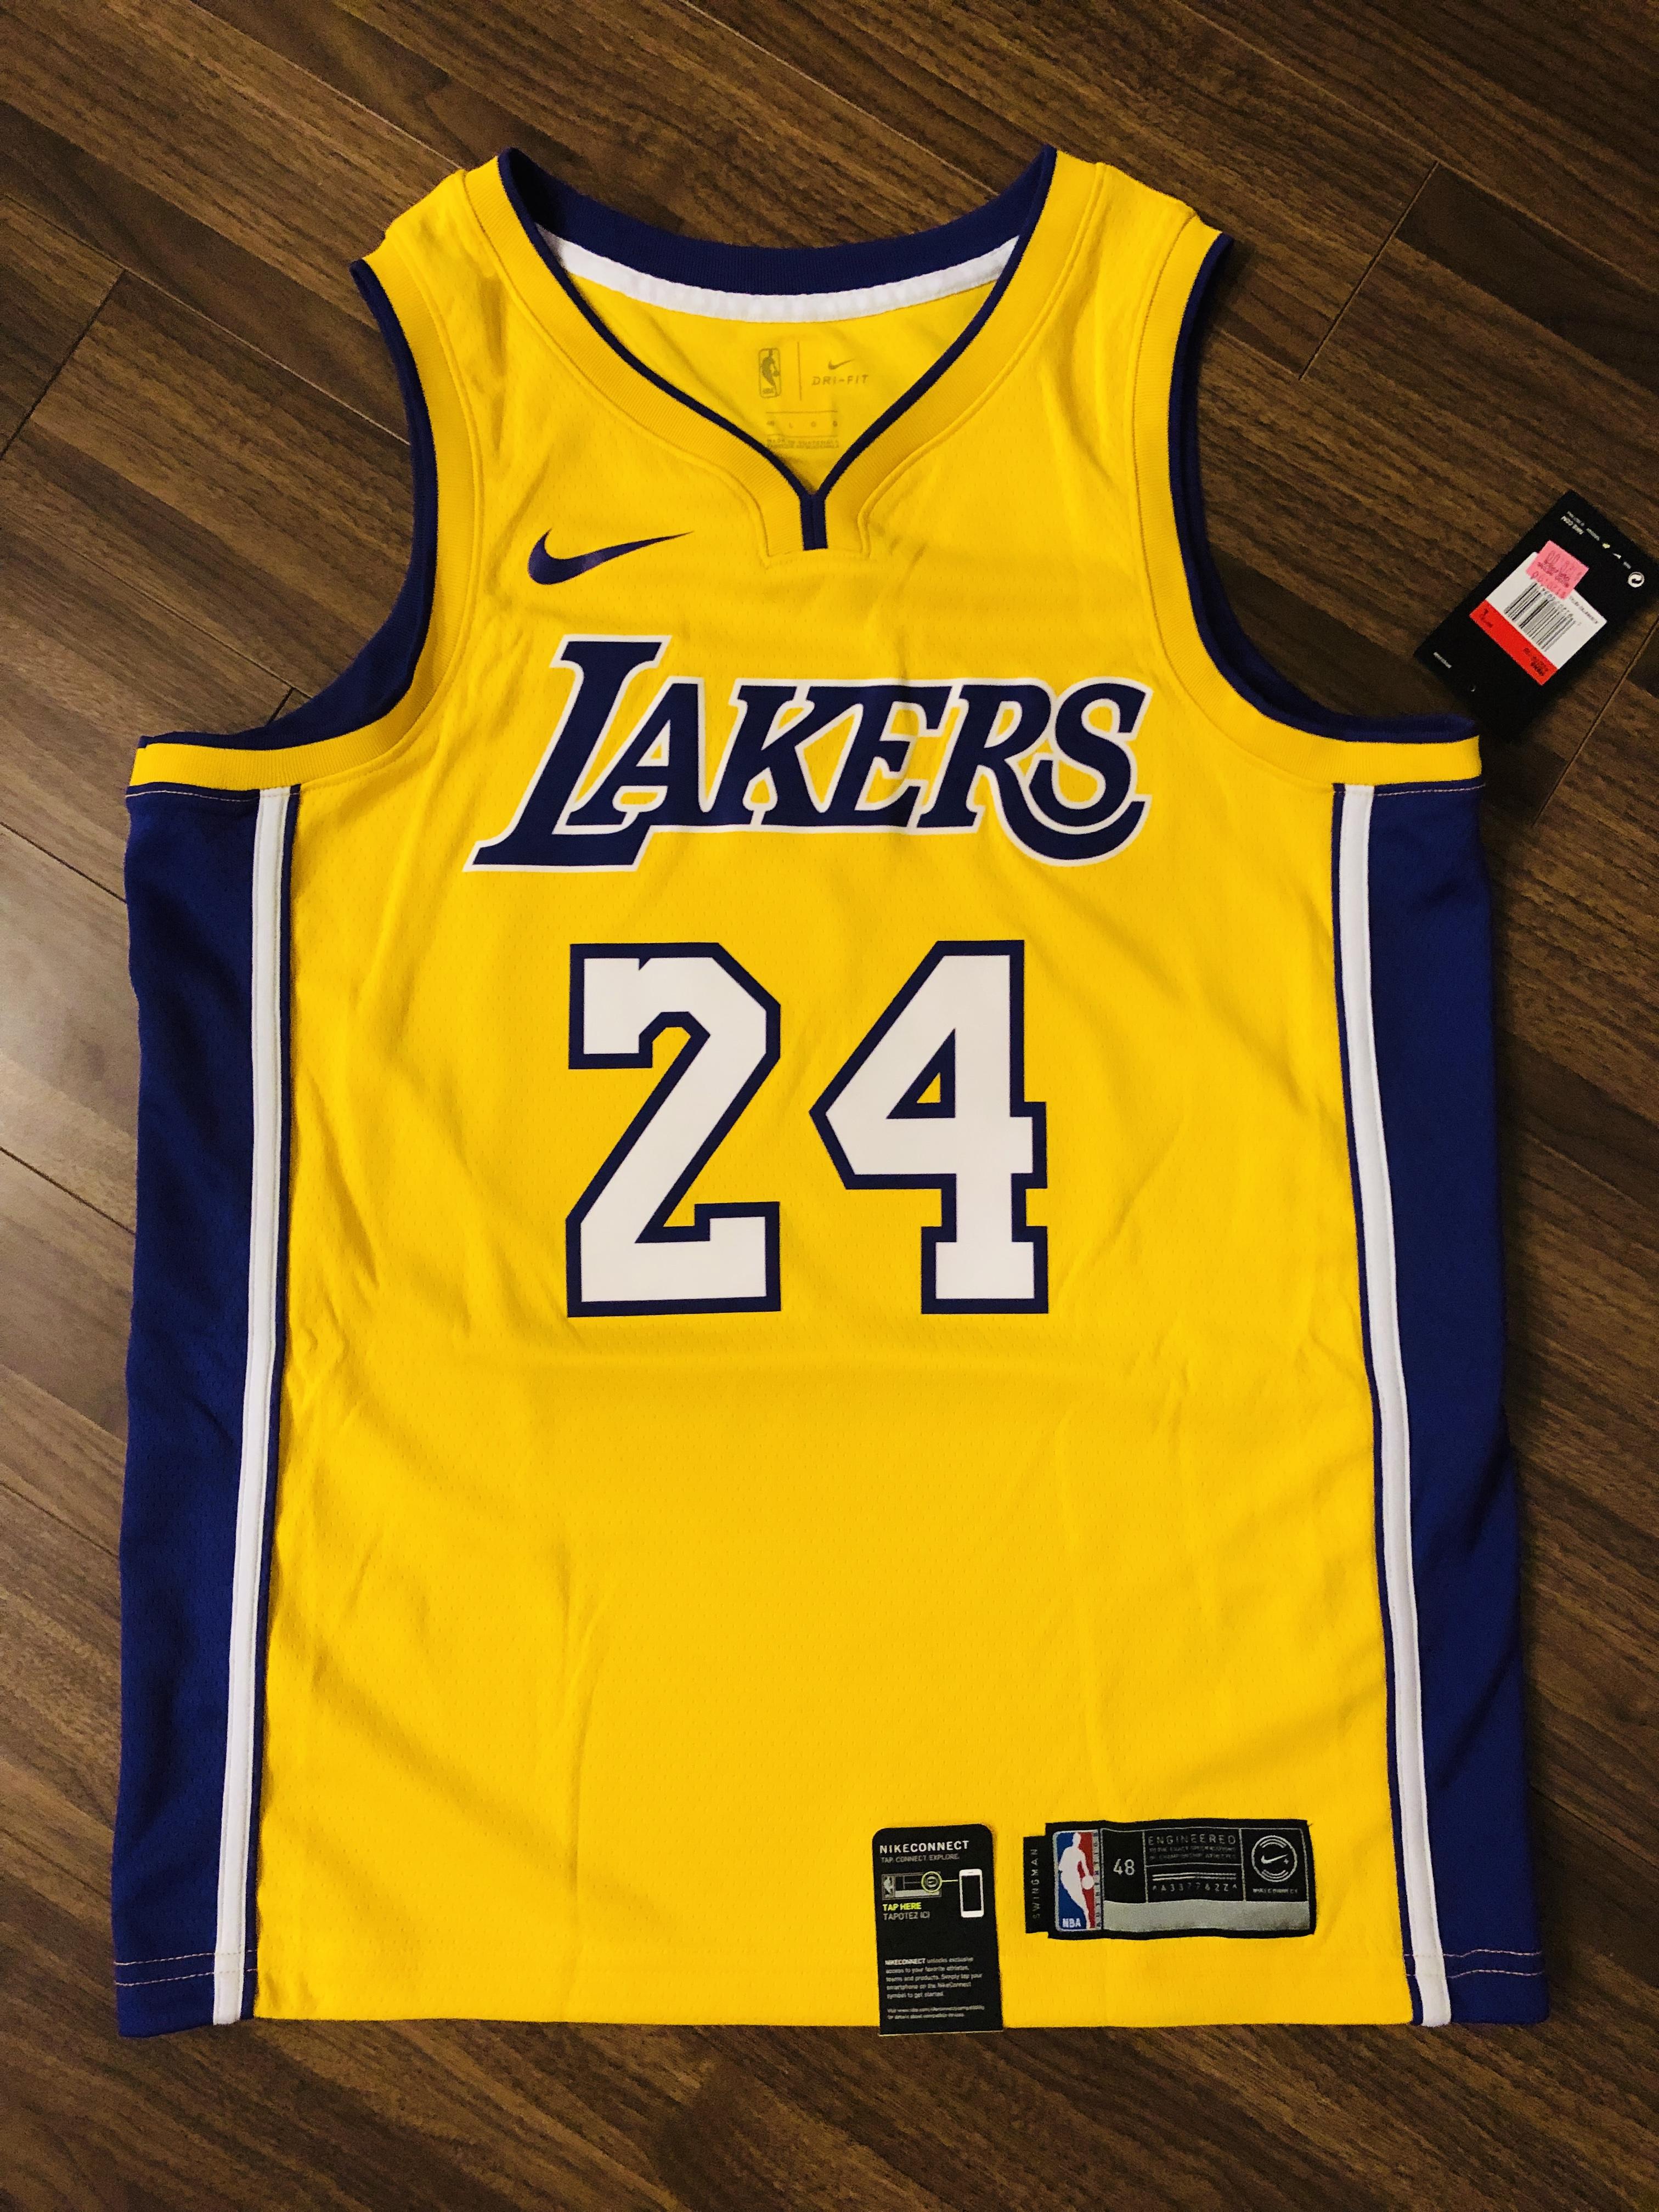 6c5fc9e5fb7 Nike Authentic Nike Kobe Bryant Swingman Lakers Jersey Aq2109-728 ...